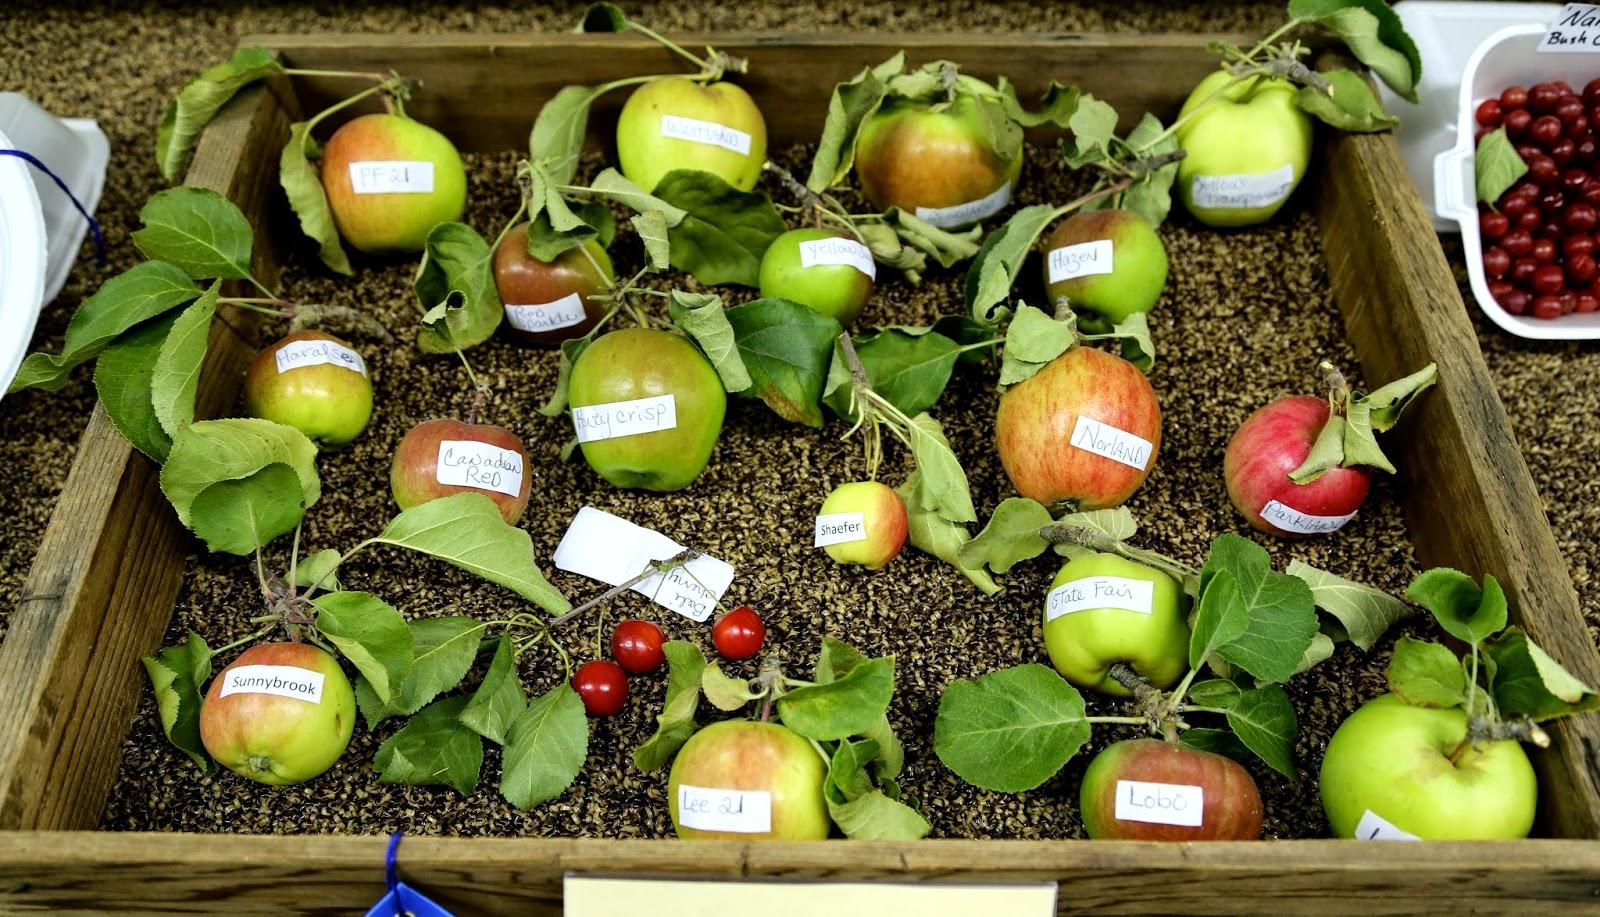 Different varieties of Alaskan apples